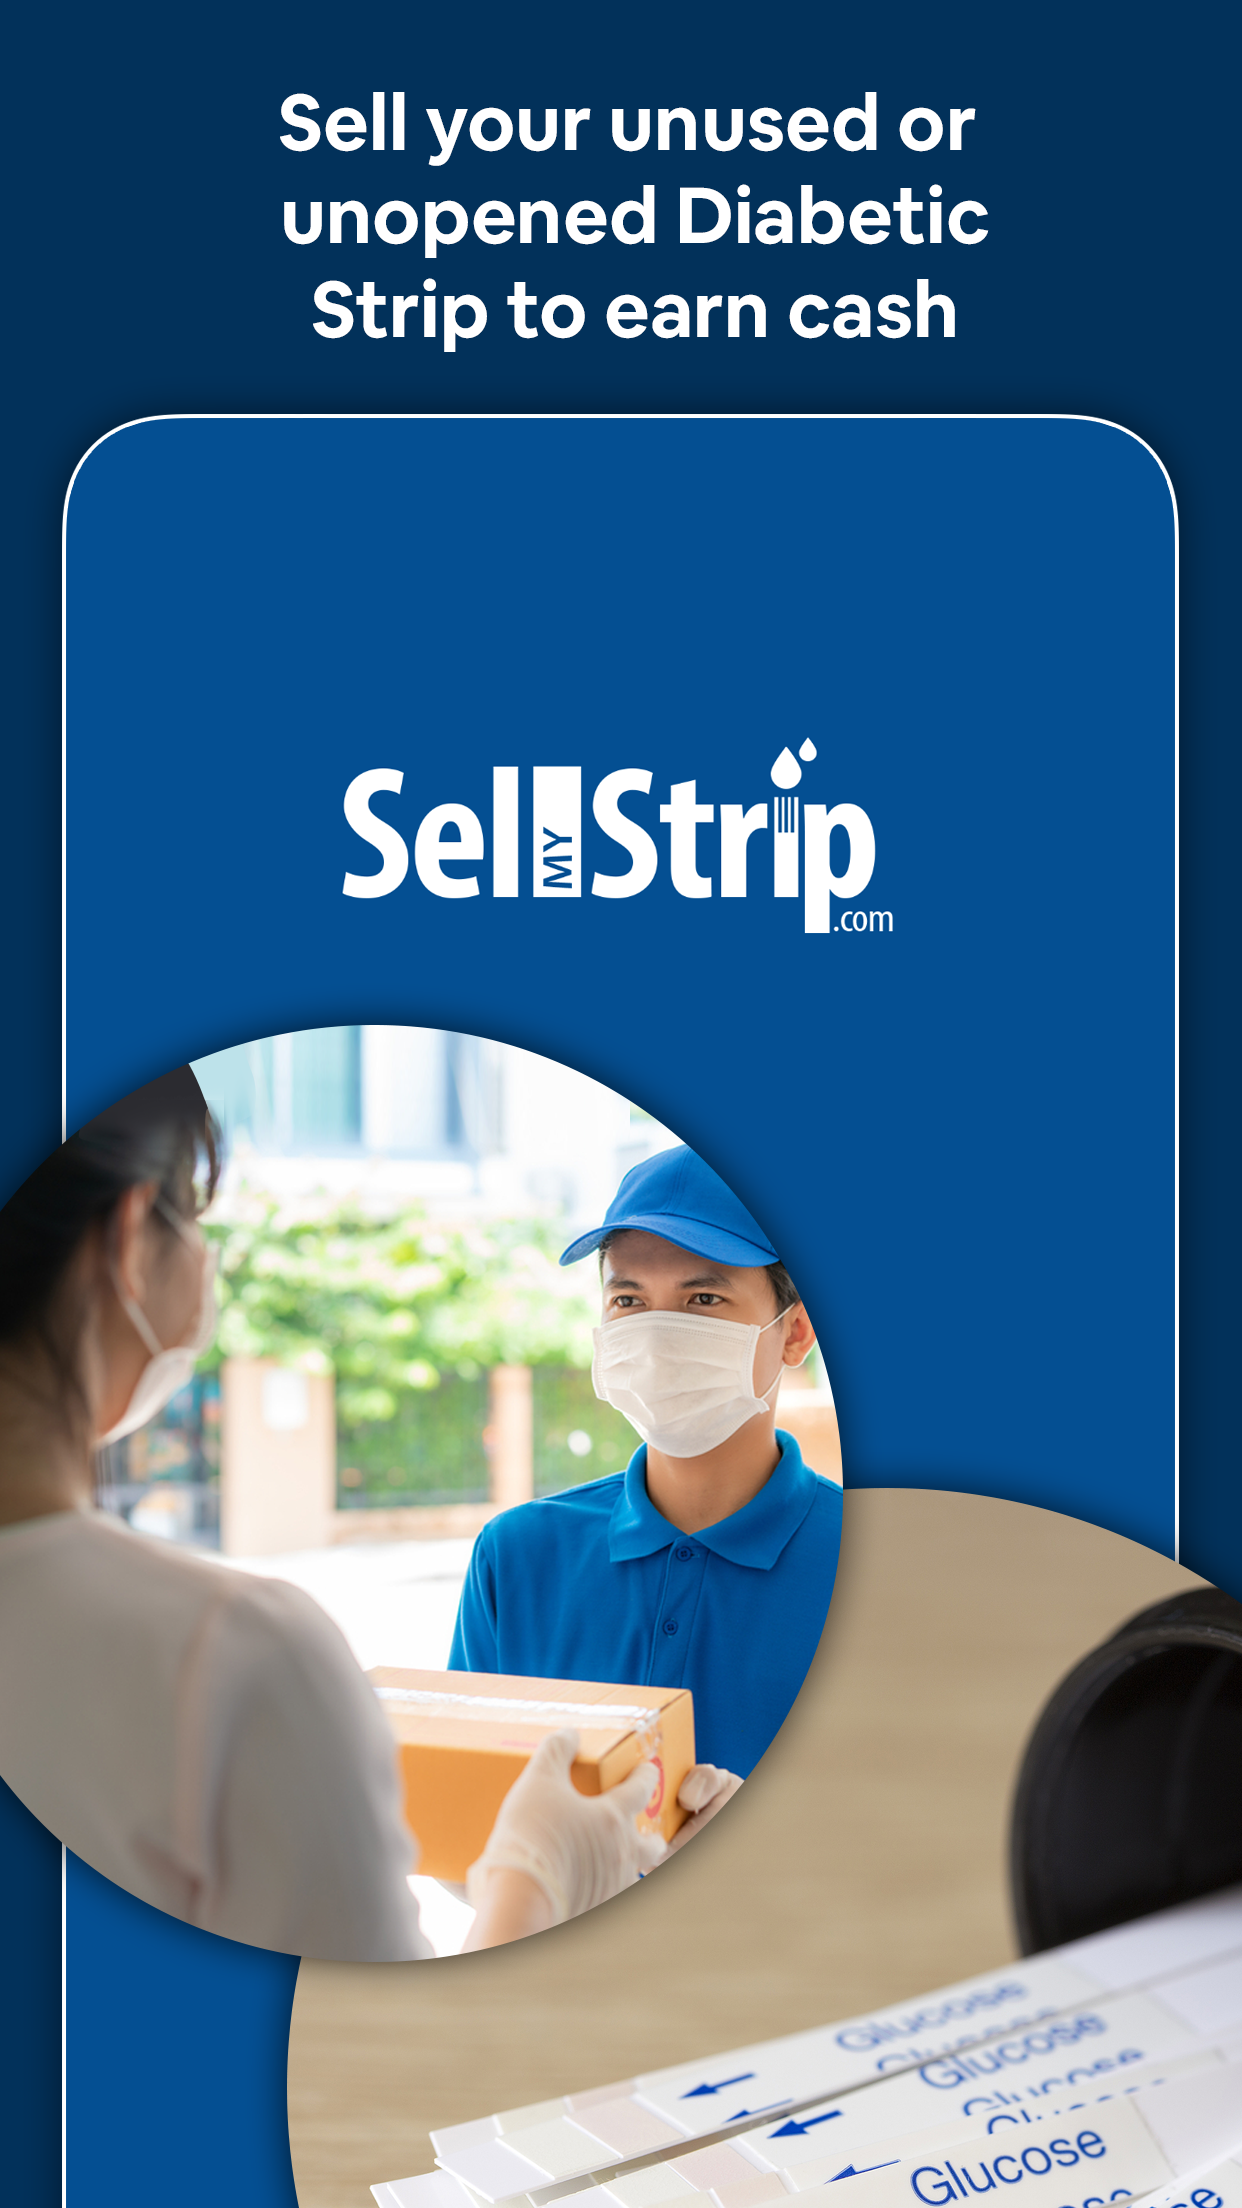 SellMyStrip